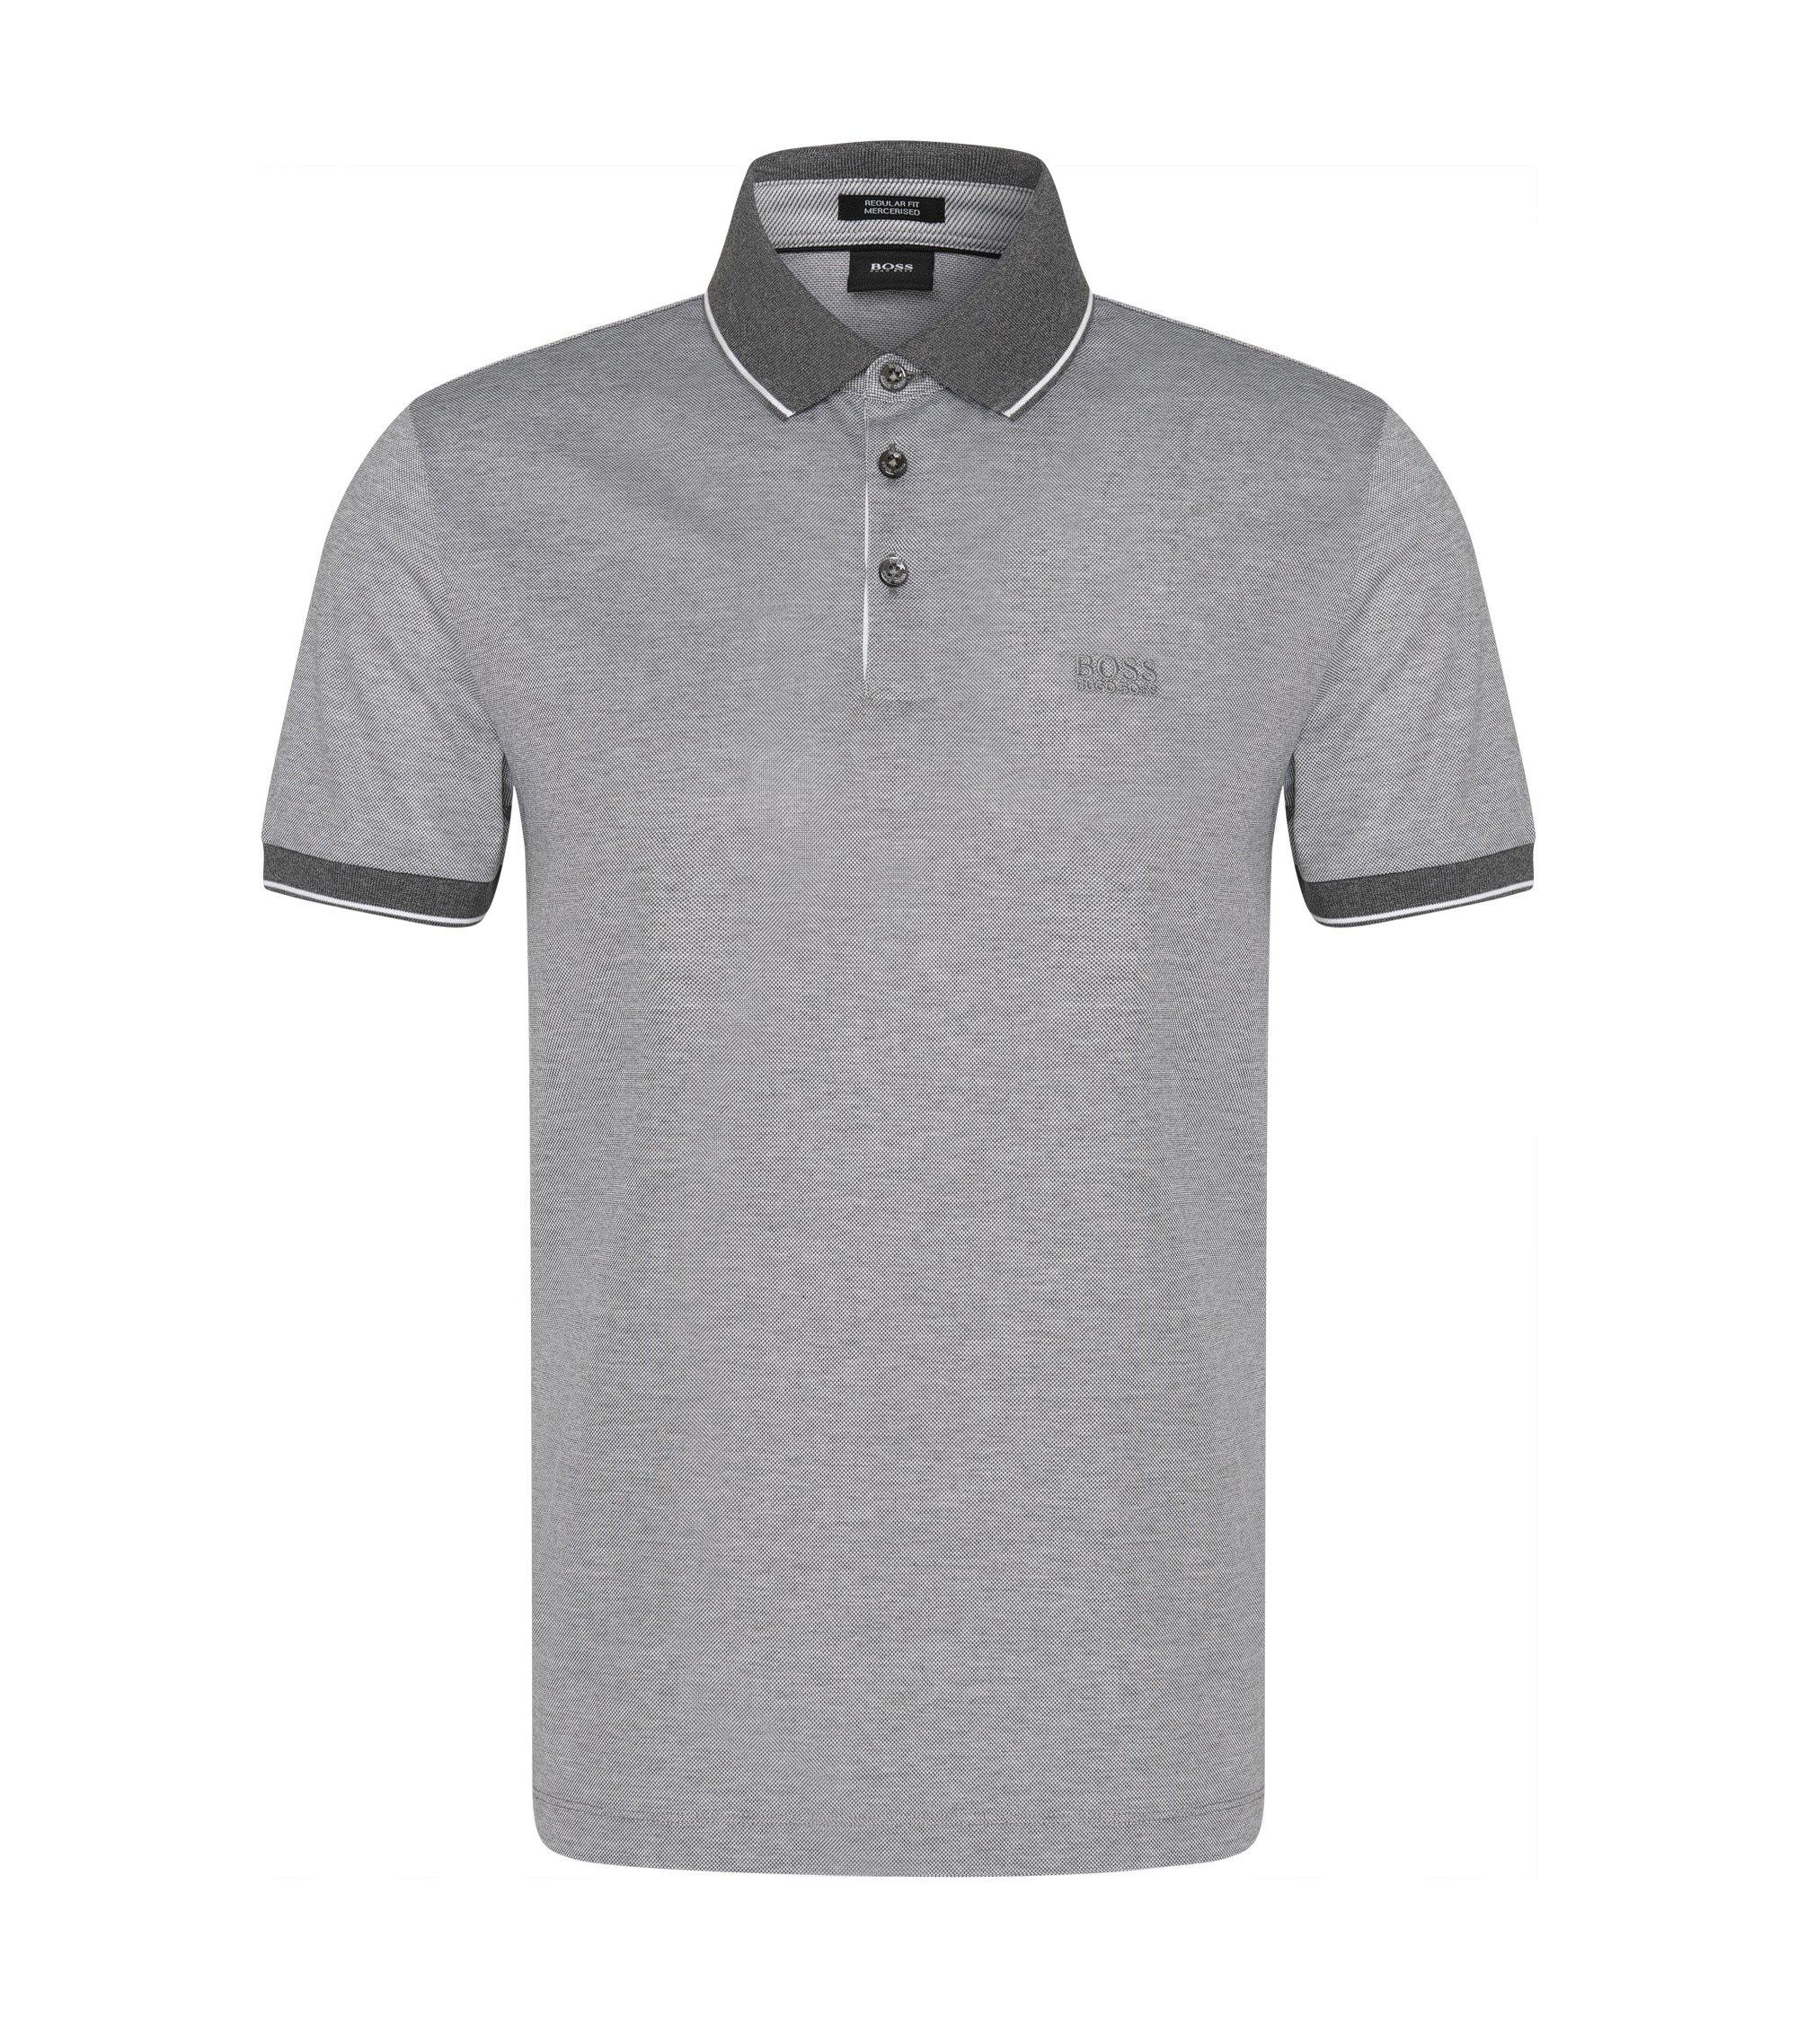 Regular-Fit Poloshirt aus veredelter Baumwolle: 'Prout 01', Grau